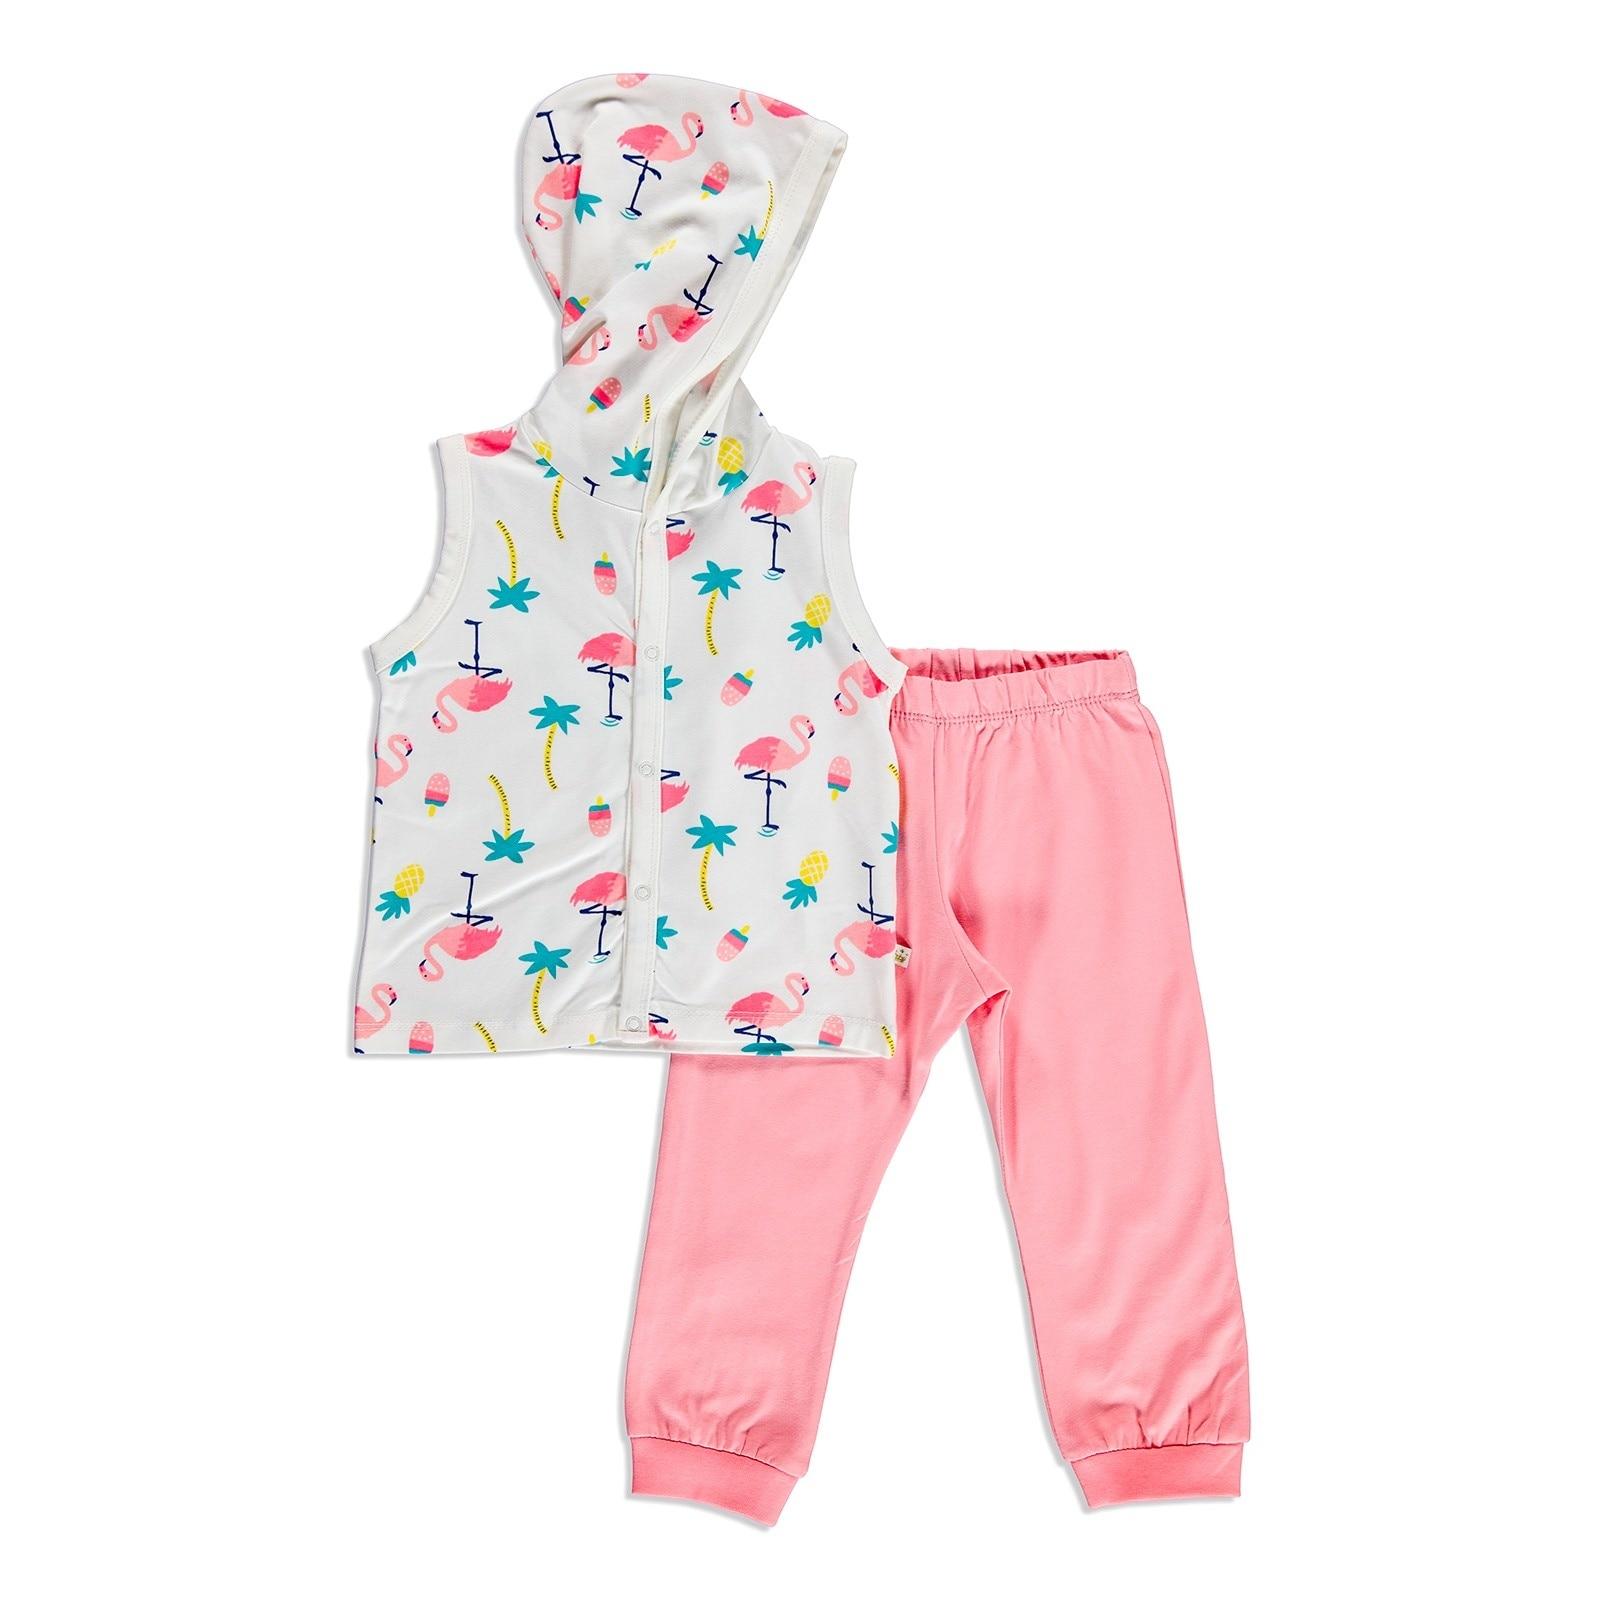 Ebebek For My Baby Summer Girl Flamingo Bodysuit Pant 2 Pcs Set